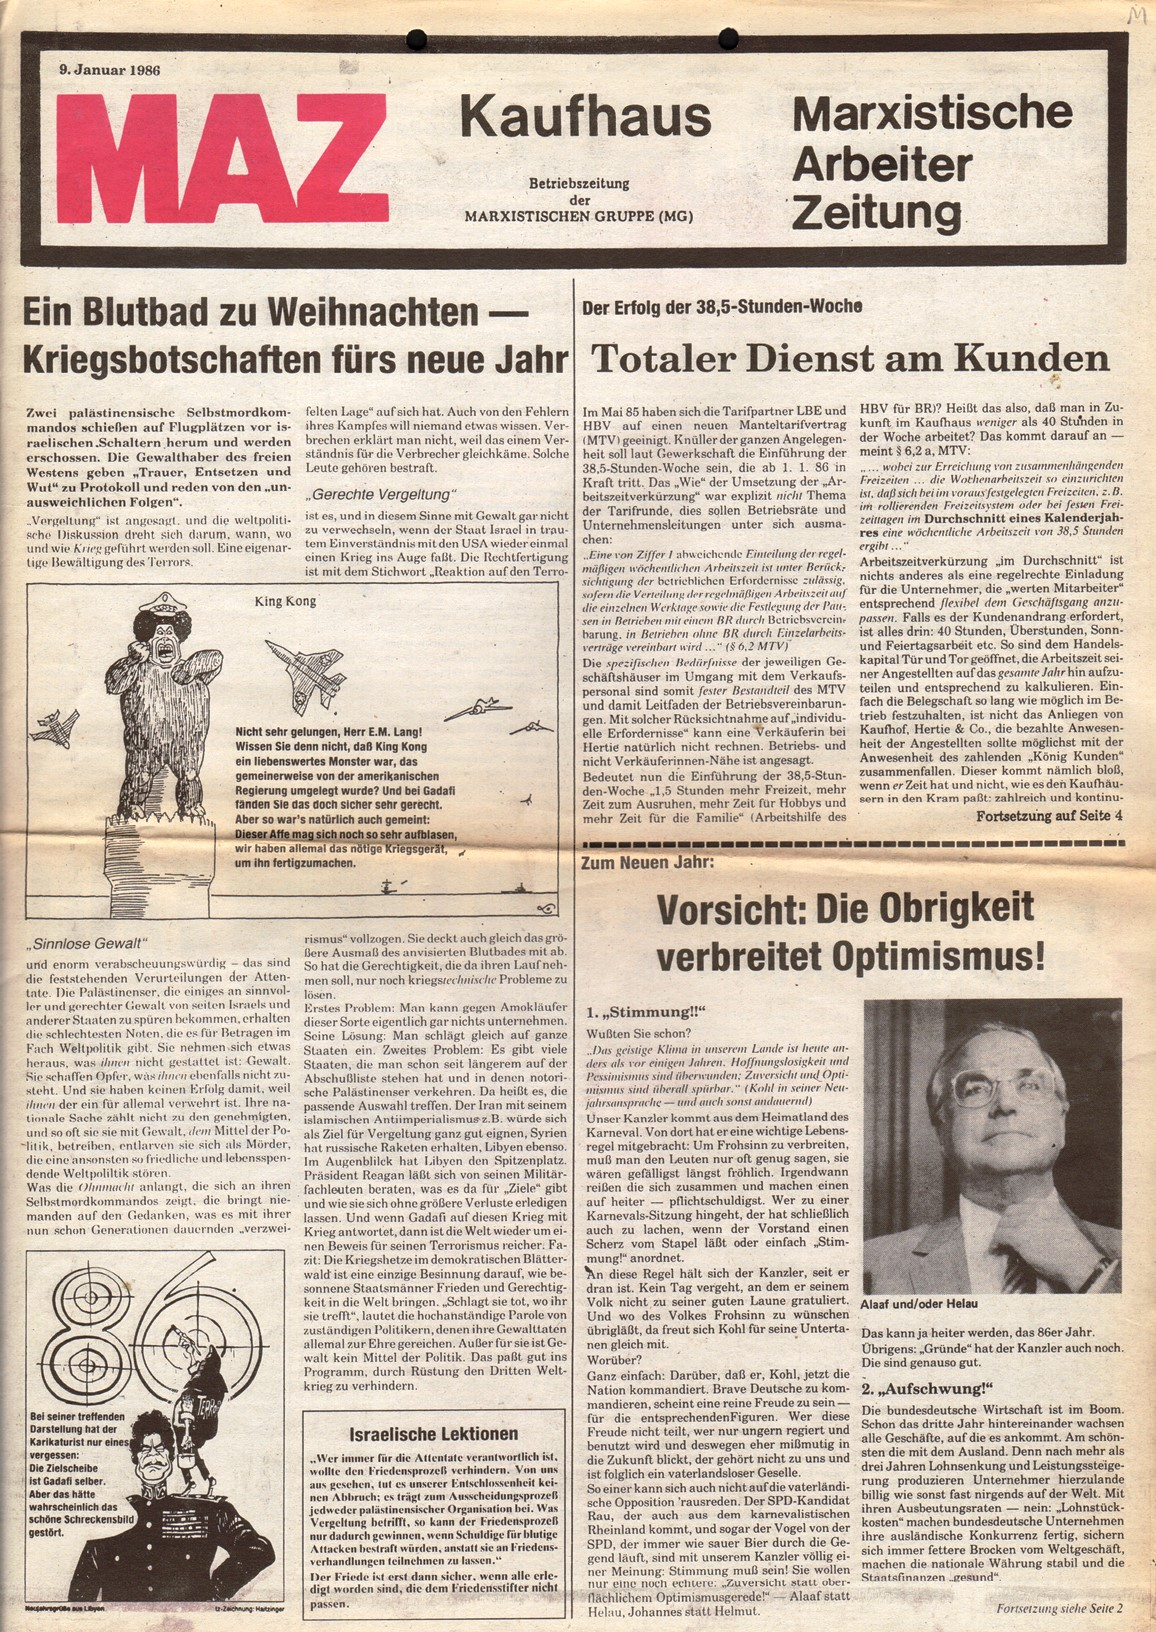 Muenchen_MG_MAZ_Kaufhaus_19860109_01